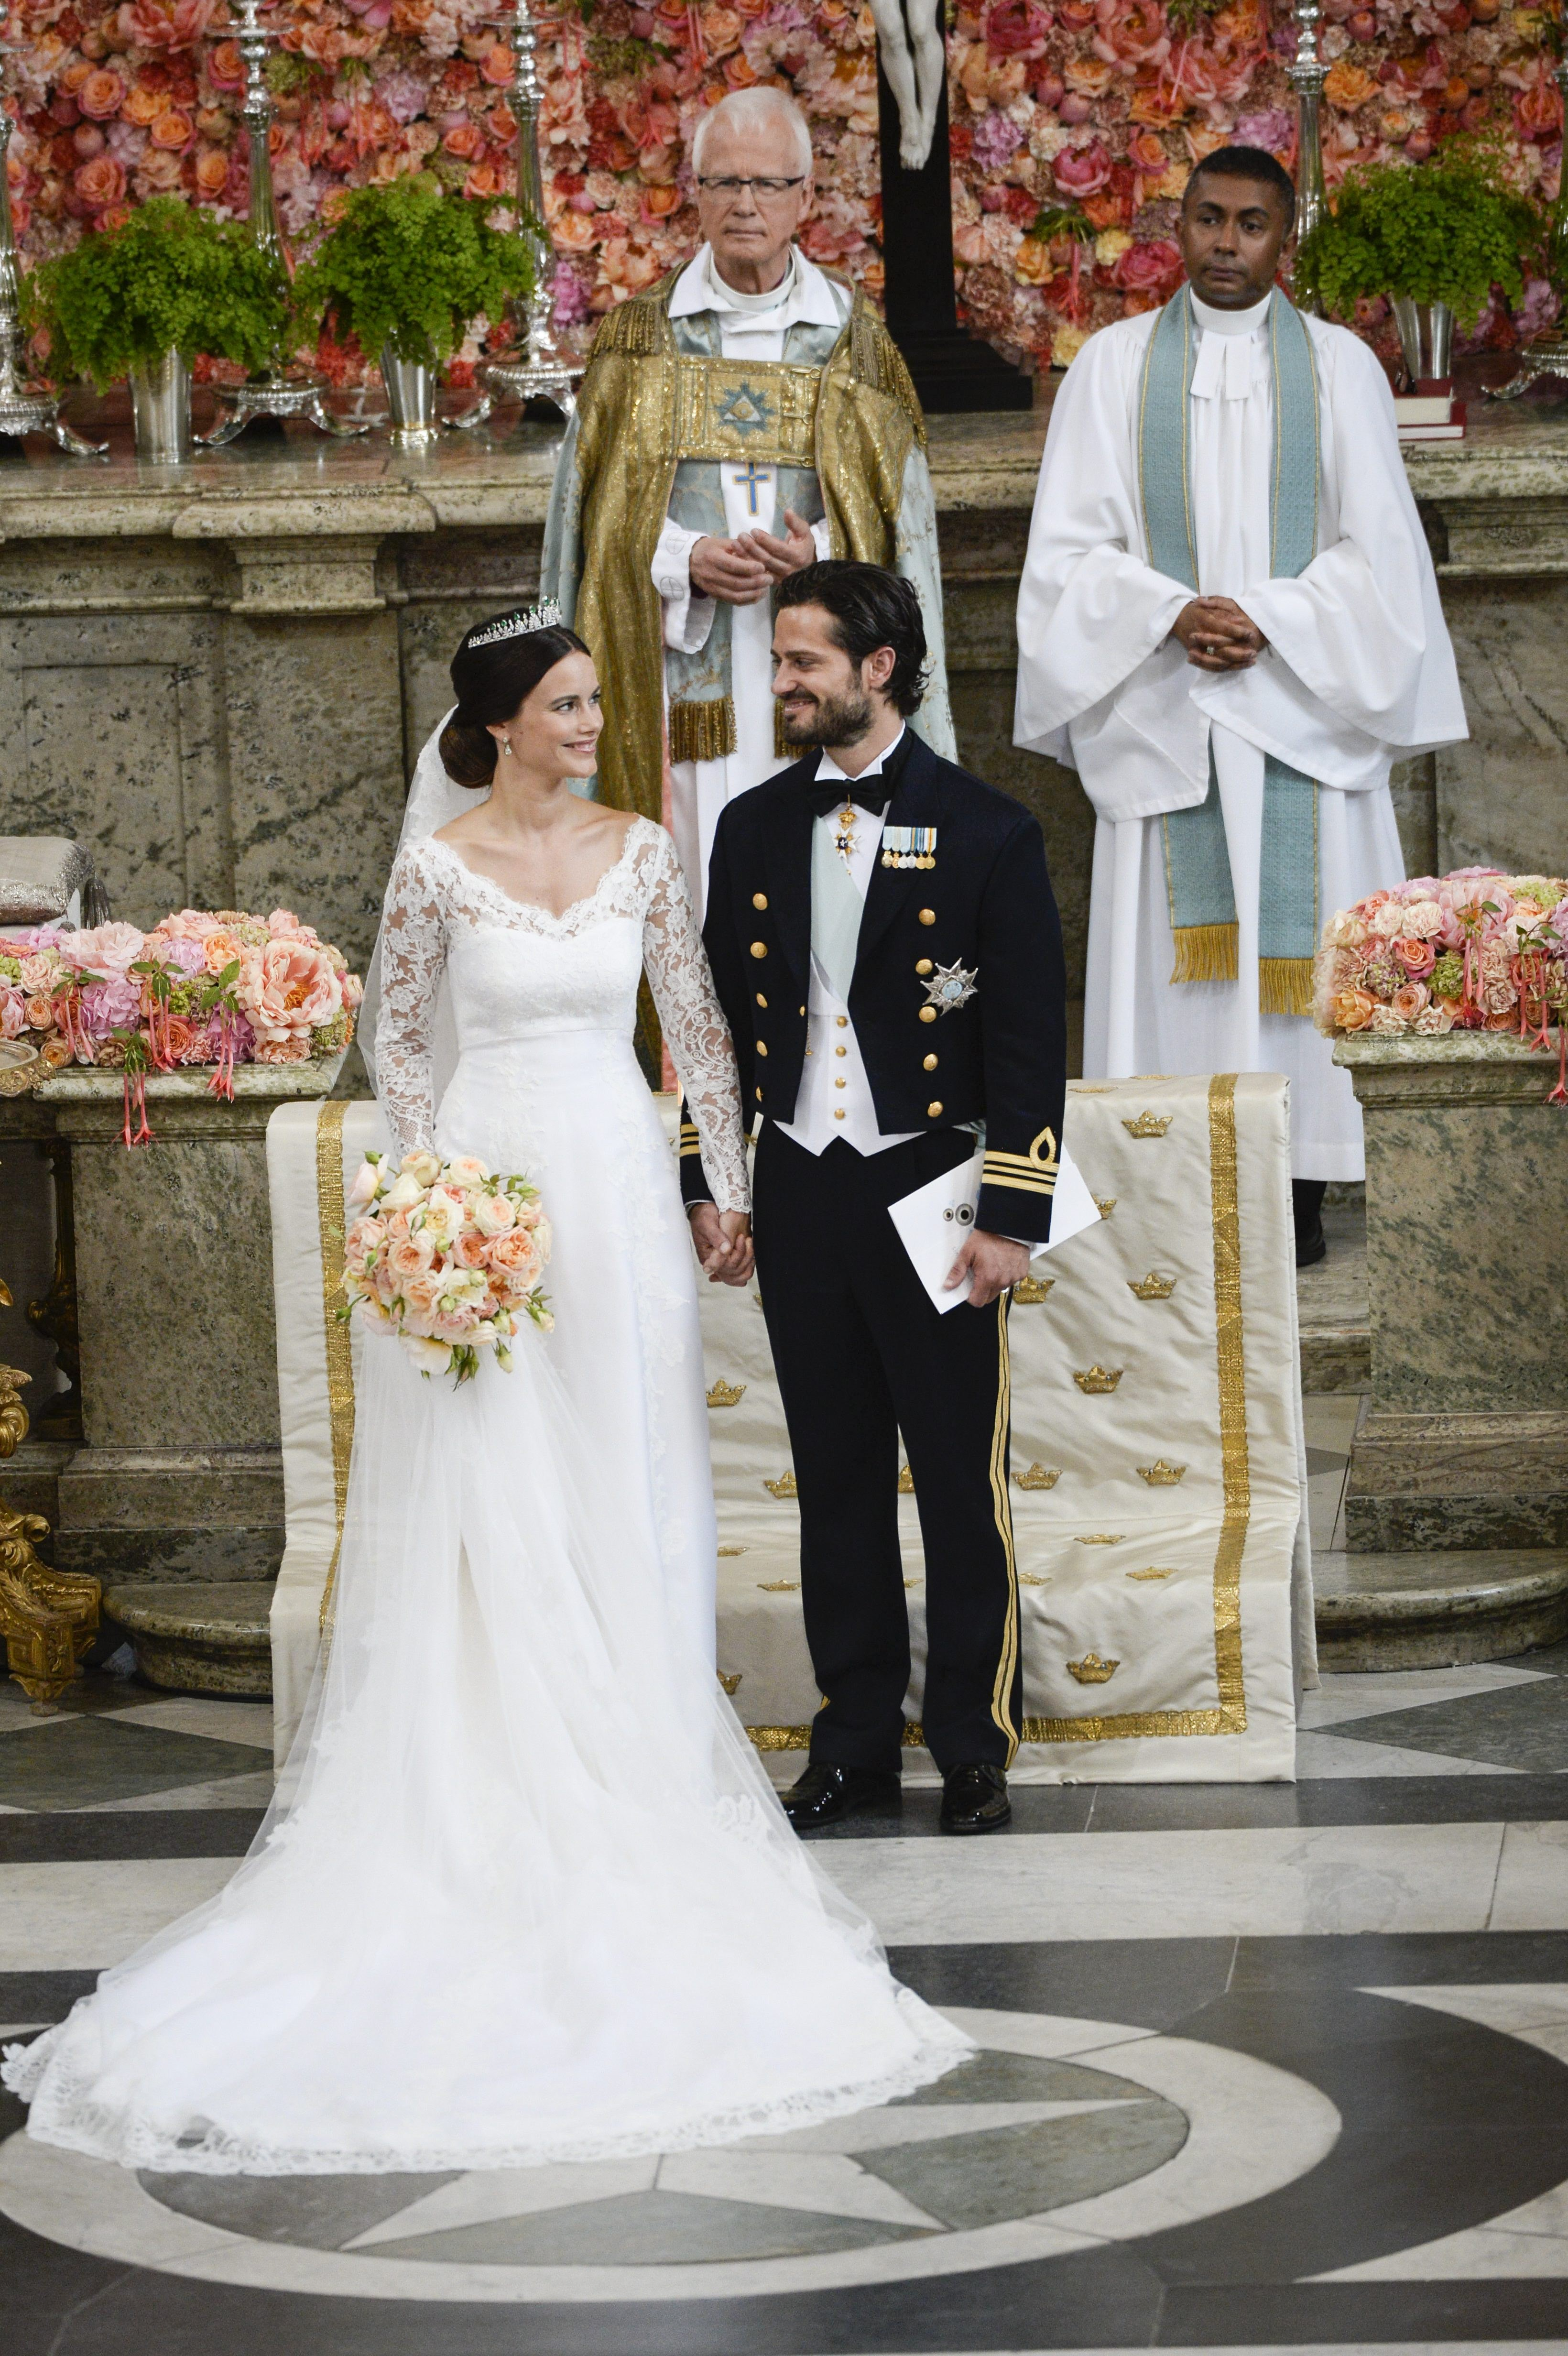 Свадьбы звезд 2017: фото Журнал Cosmopolitan